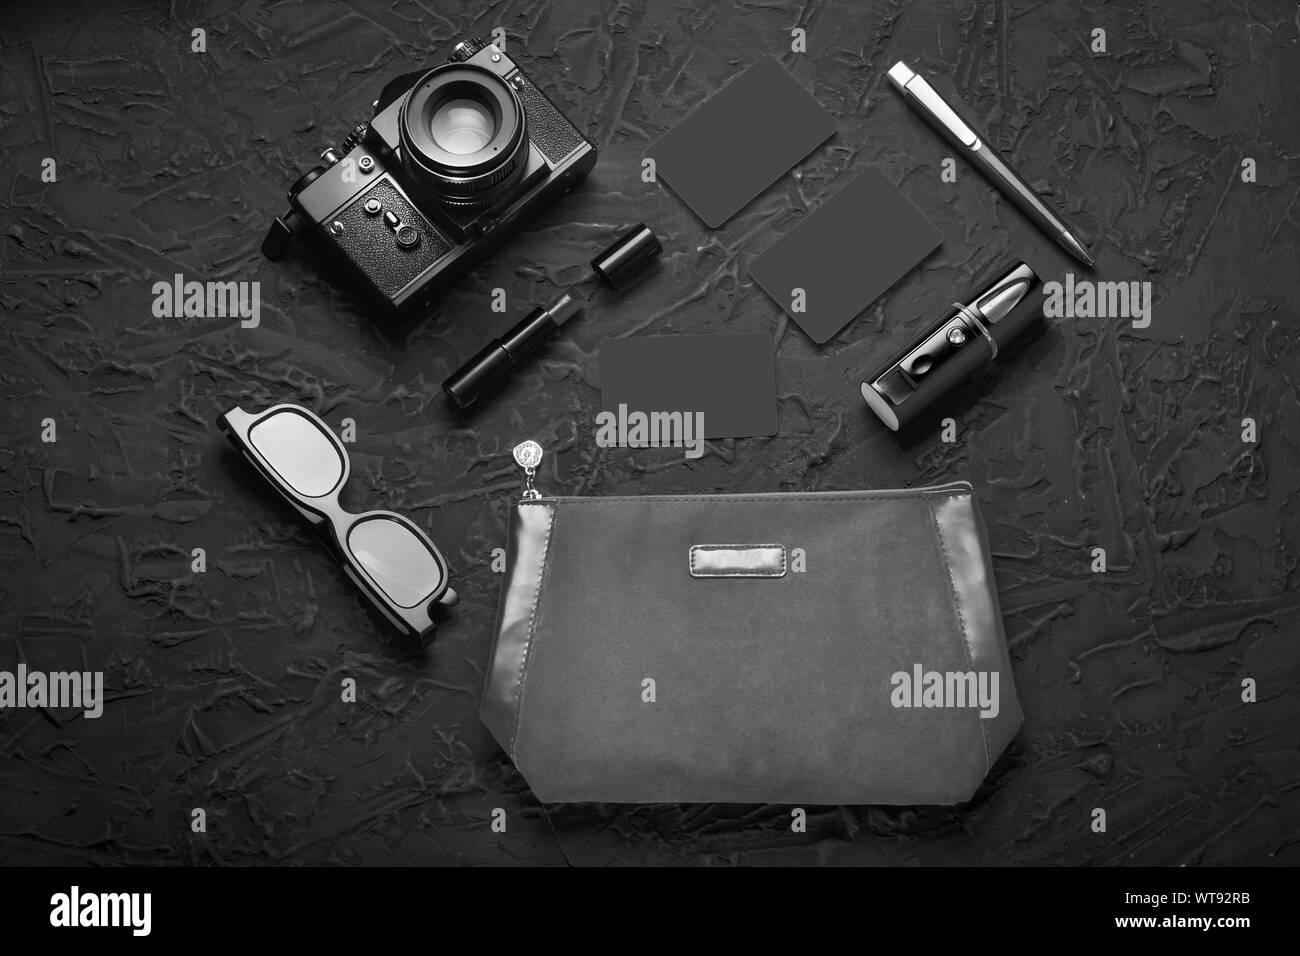 mass media, hiding,  illustrations, shutterstock, photographers, digital cameras, wedding Stock Photo